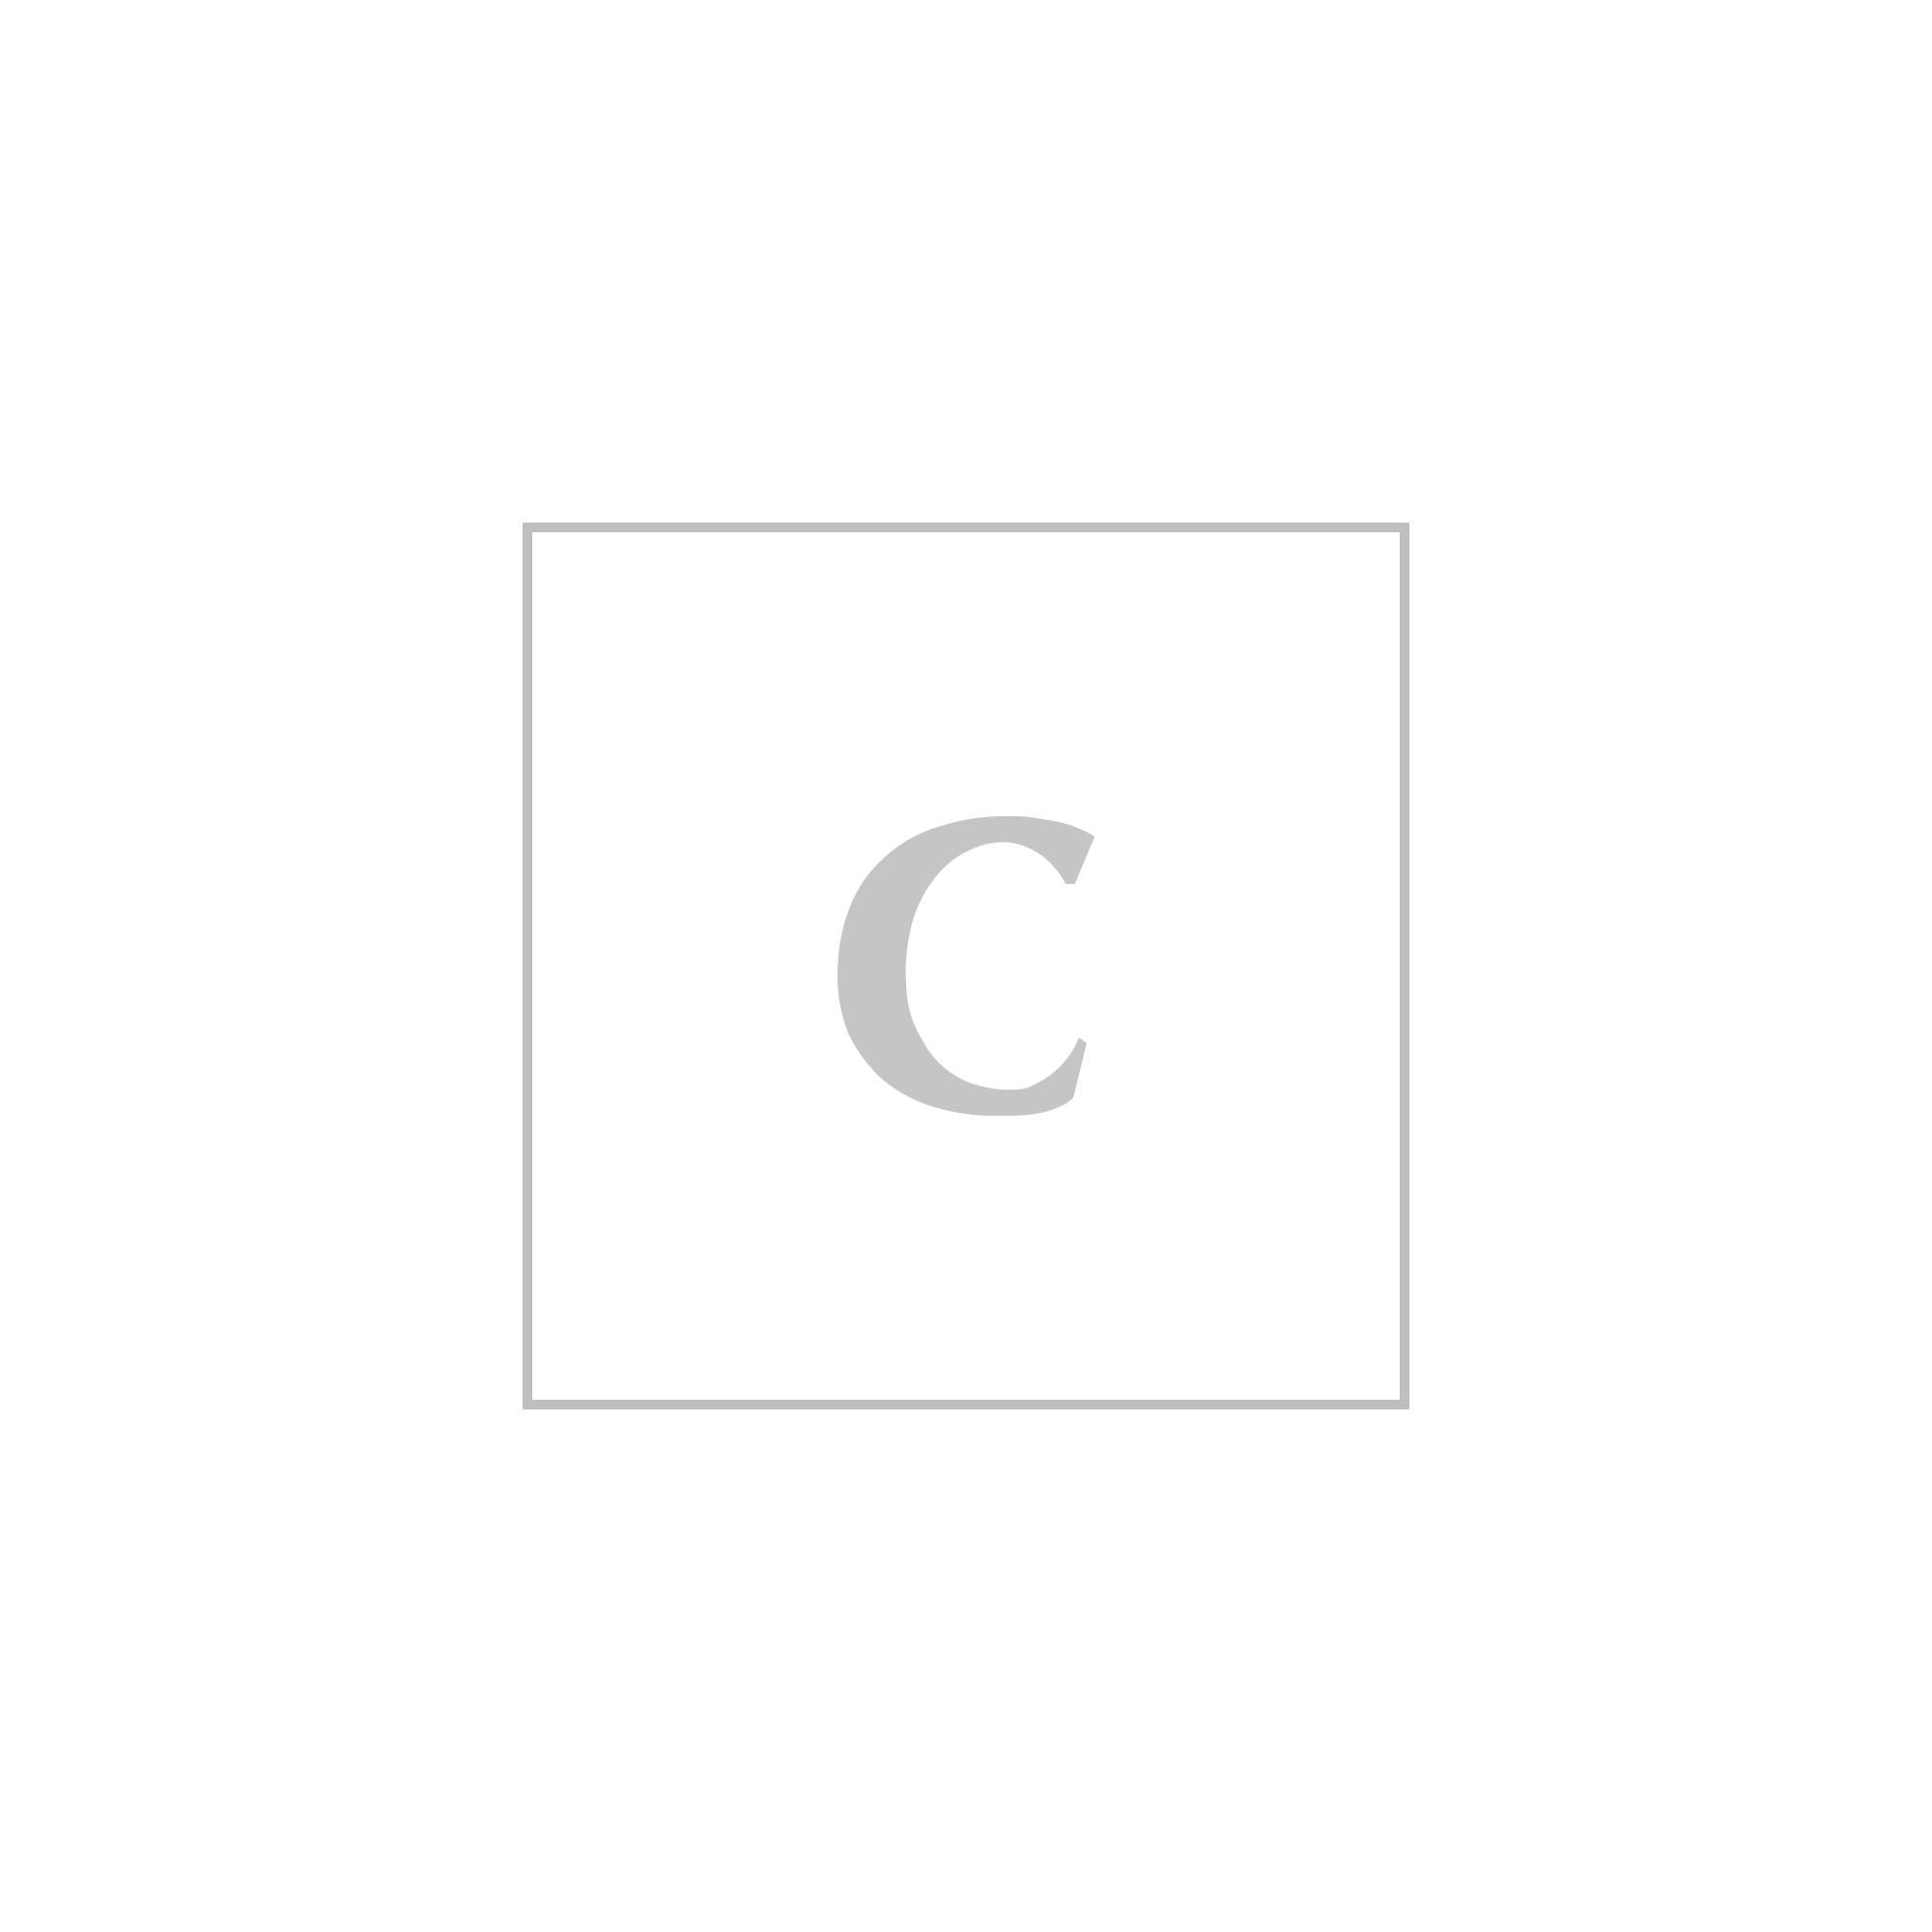 084baf2676b amazon prada 1mh176 saffiano leather short trifold clasp wallet pink  orchard luxury brands online f7772 4685f  sale prada saffiano cardholder  8b271 f3a85